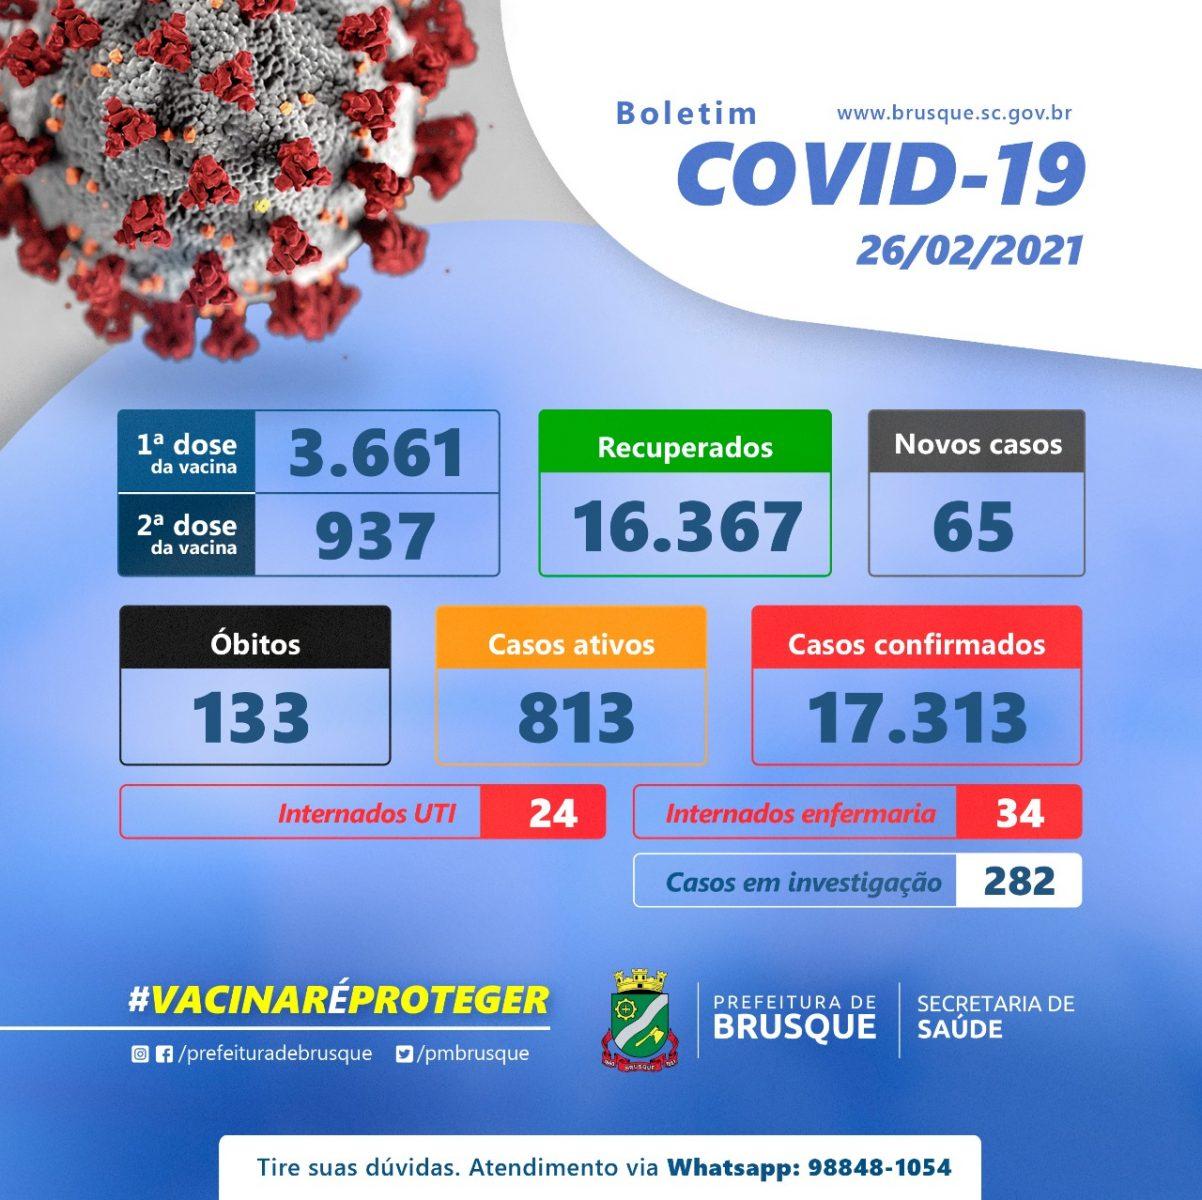 Covid-19: Confira o boletim epidemiológico desta sexta-feira (26)